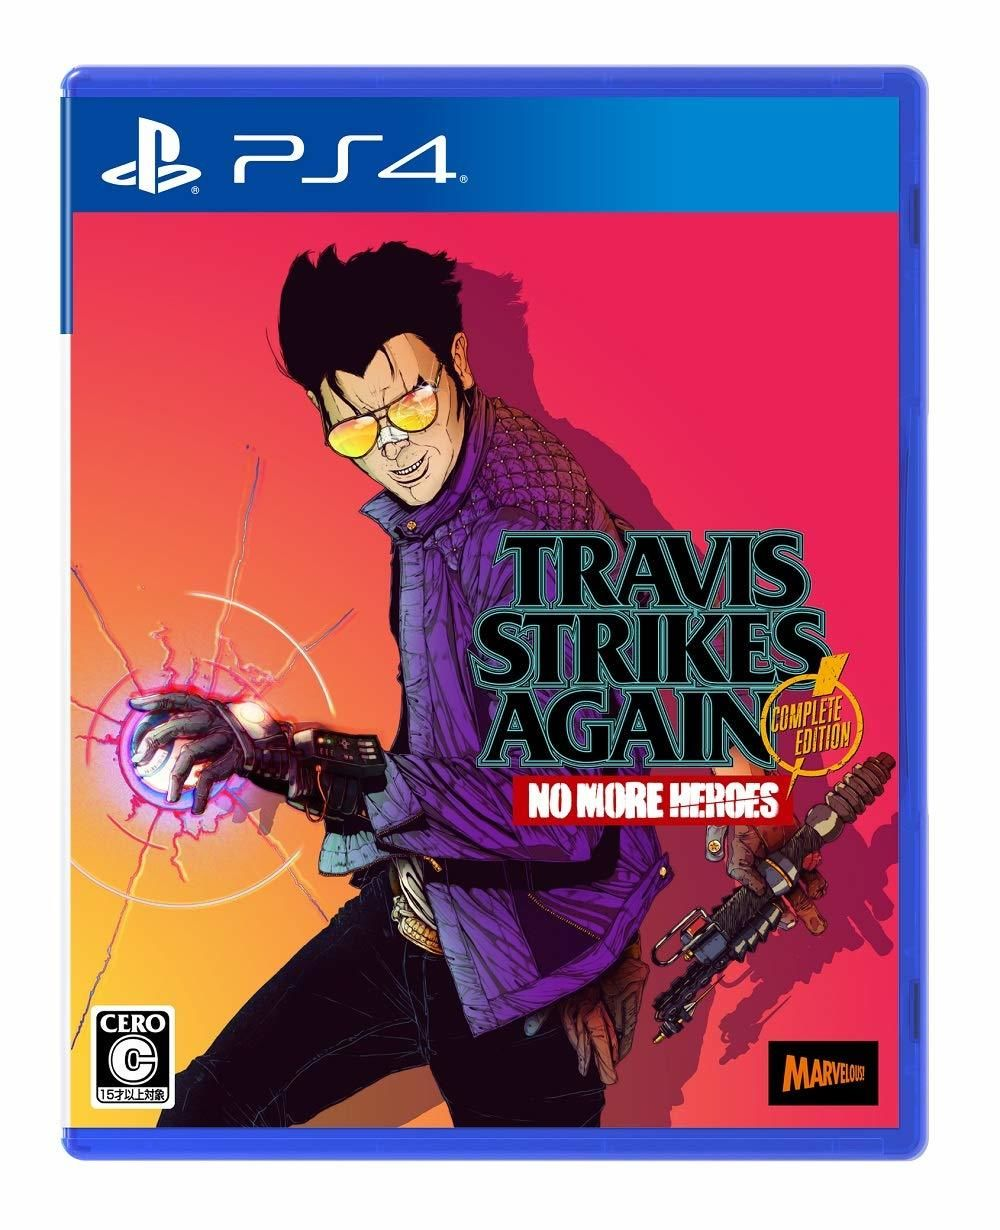 На PlayStation 4 и PC появится сразу полное издание Travis Strikes Again: No More Heroes, стала известна точная дата релиза